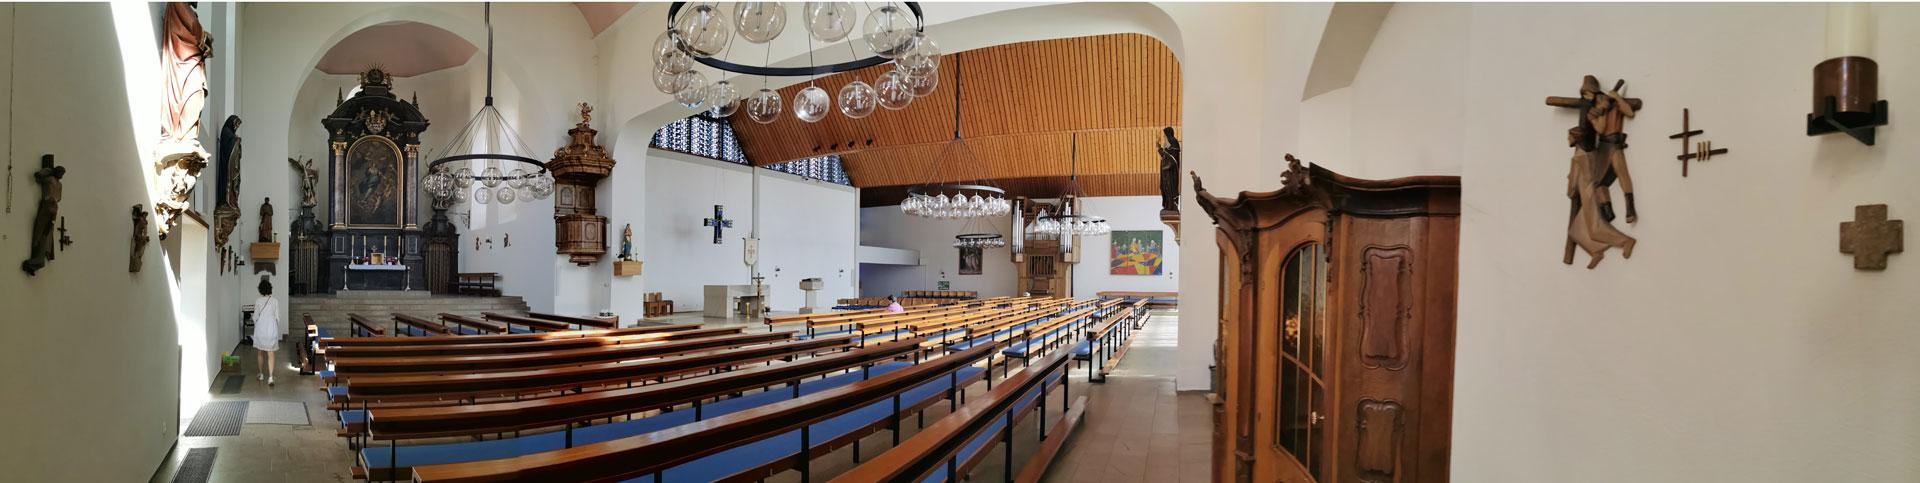 St.Michael Panorama